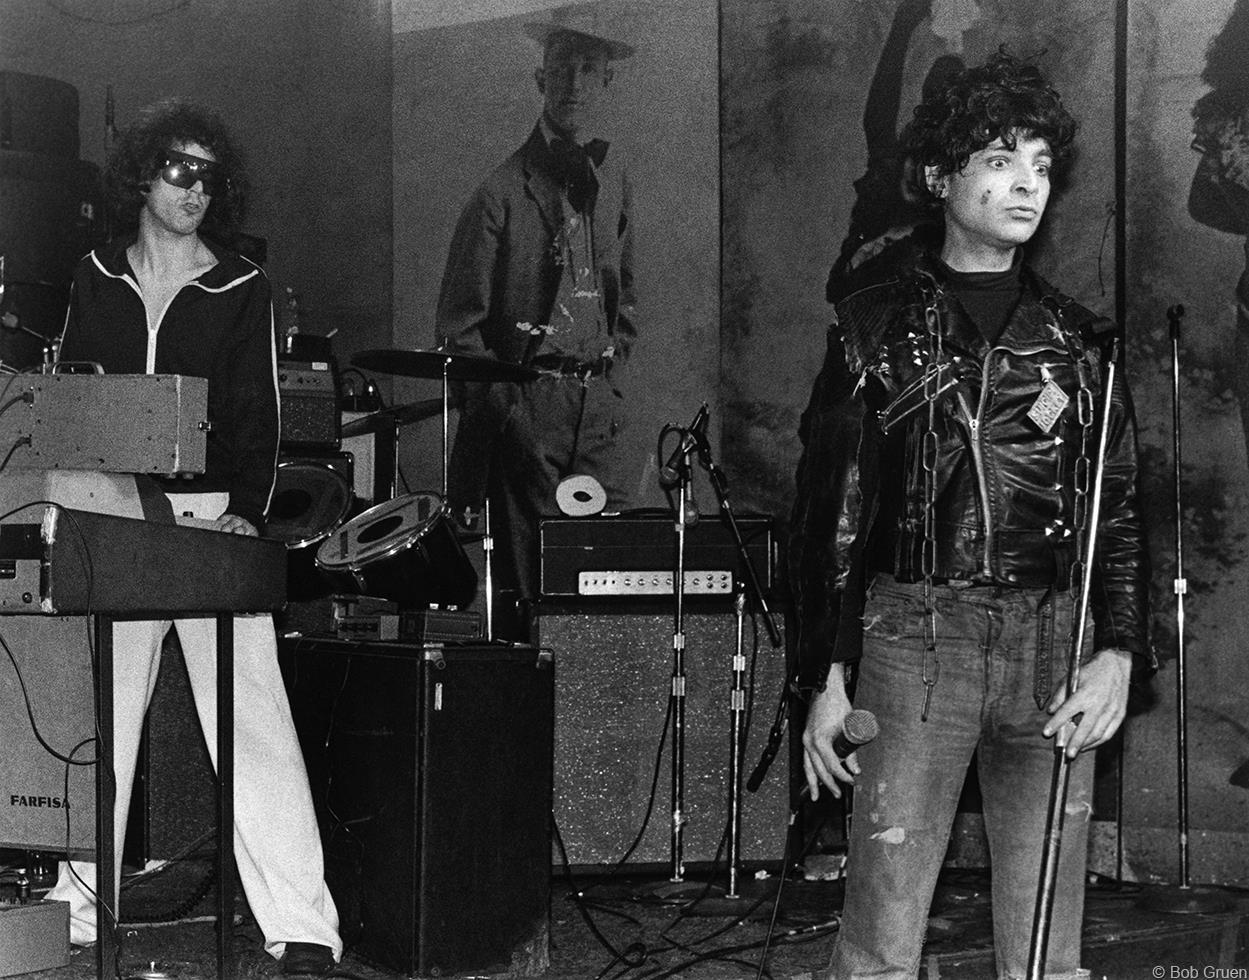 Suicide: Martin Rev and Alan Vega, performing at CBGBs, 1977